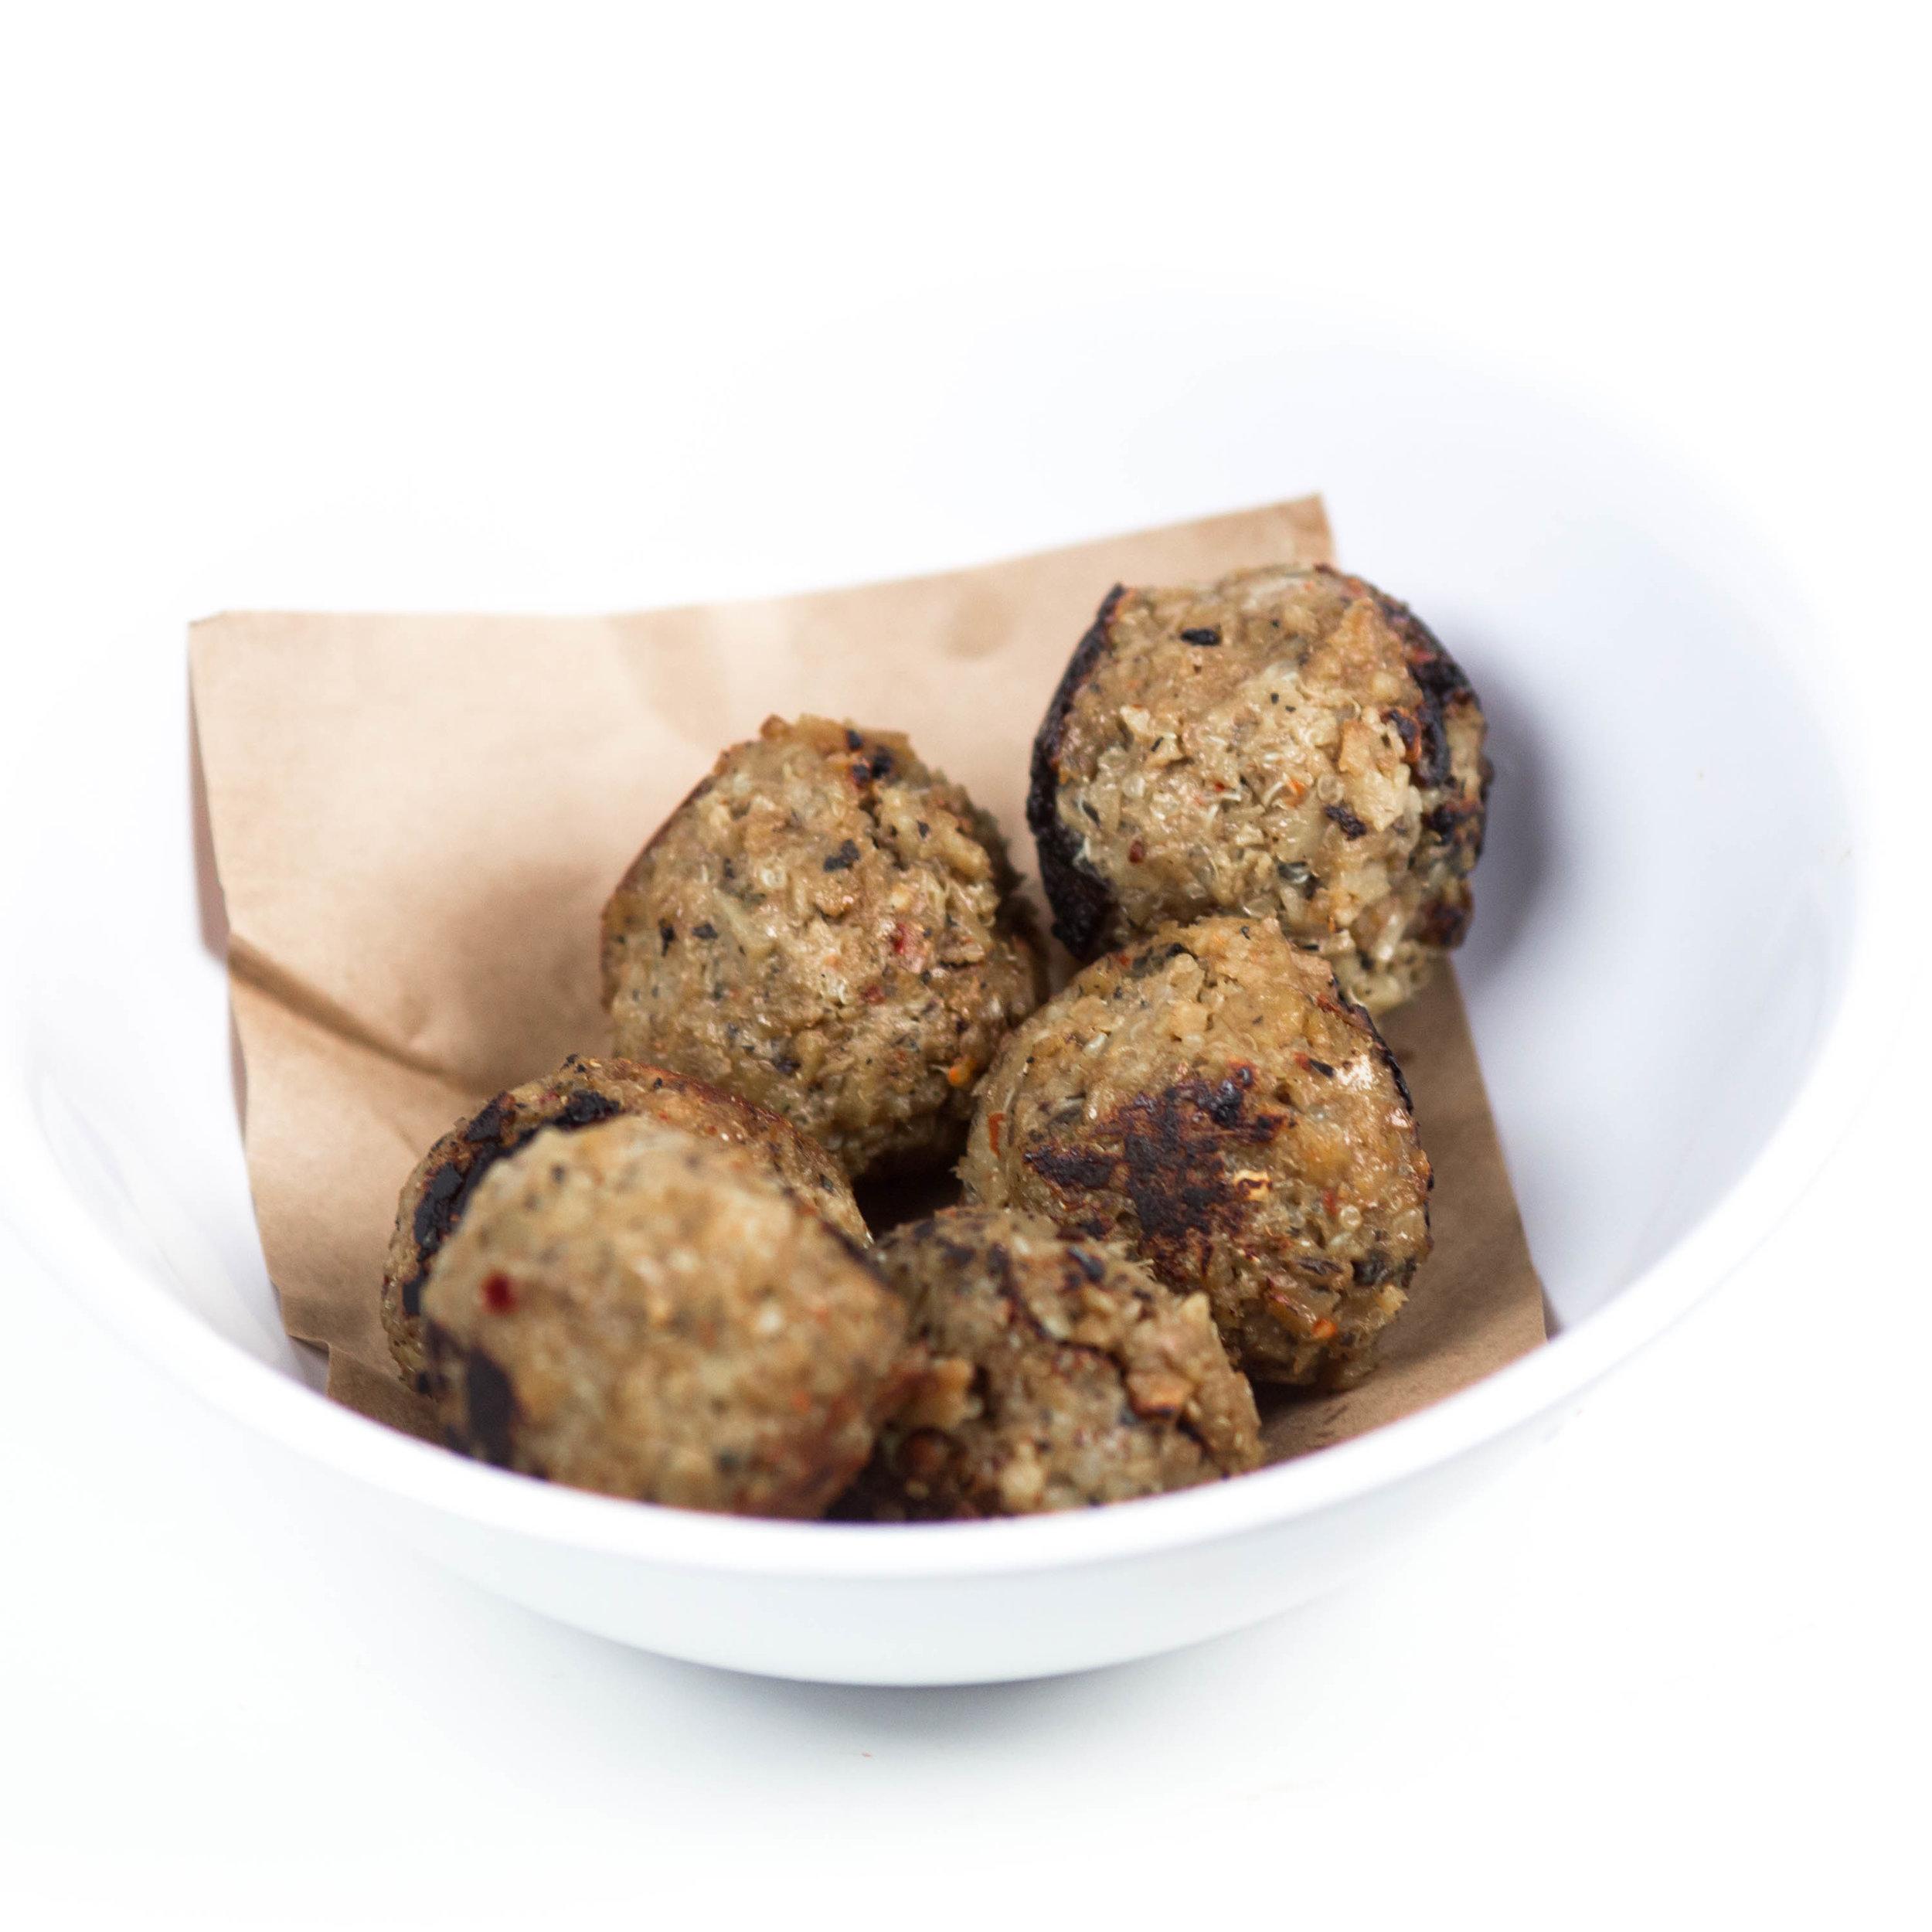 meatballs-7344.jpg